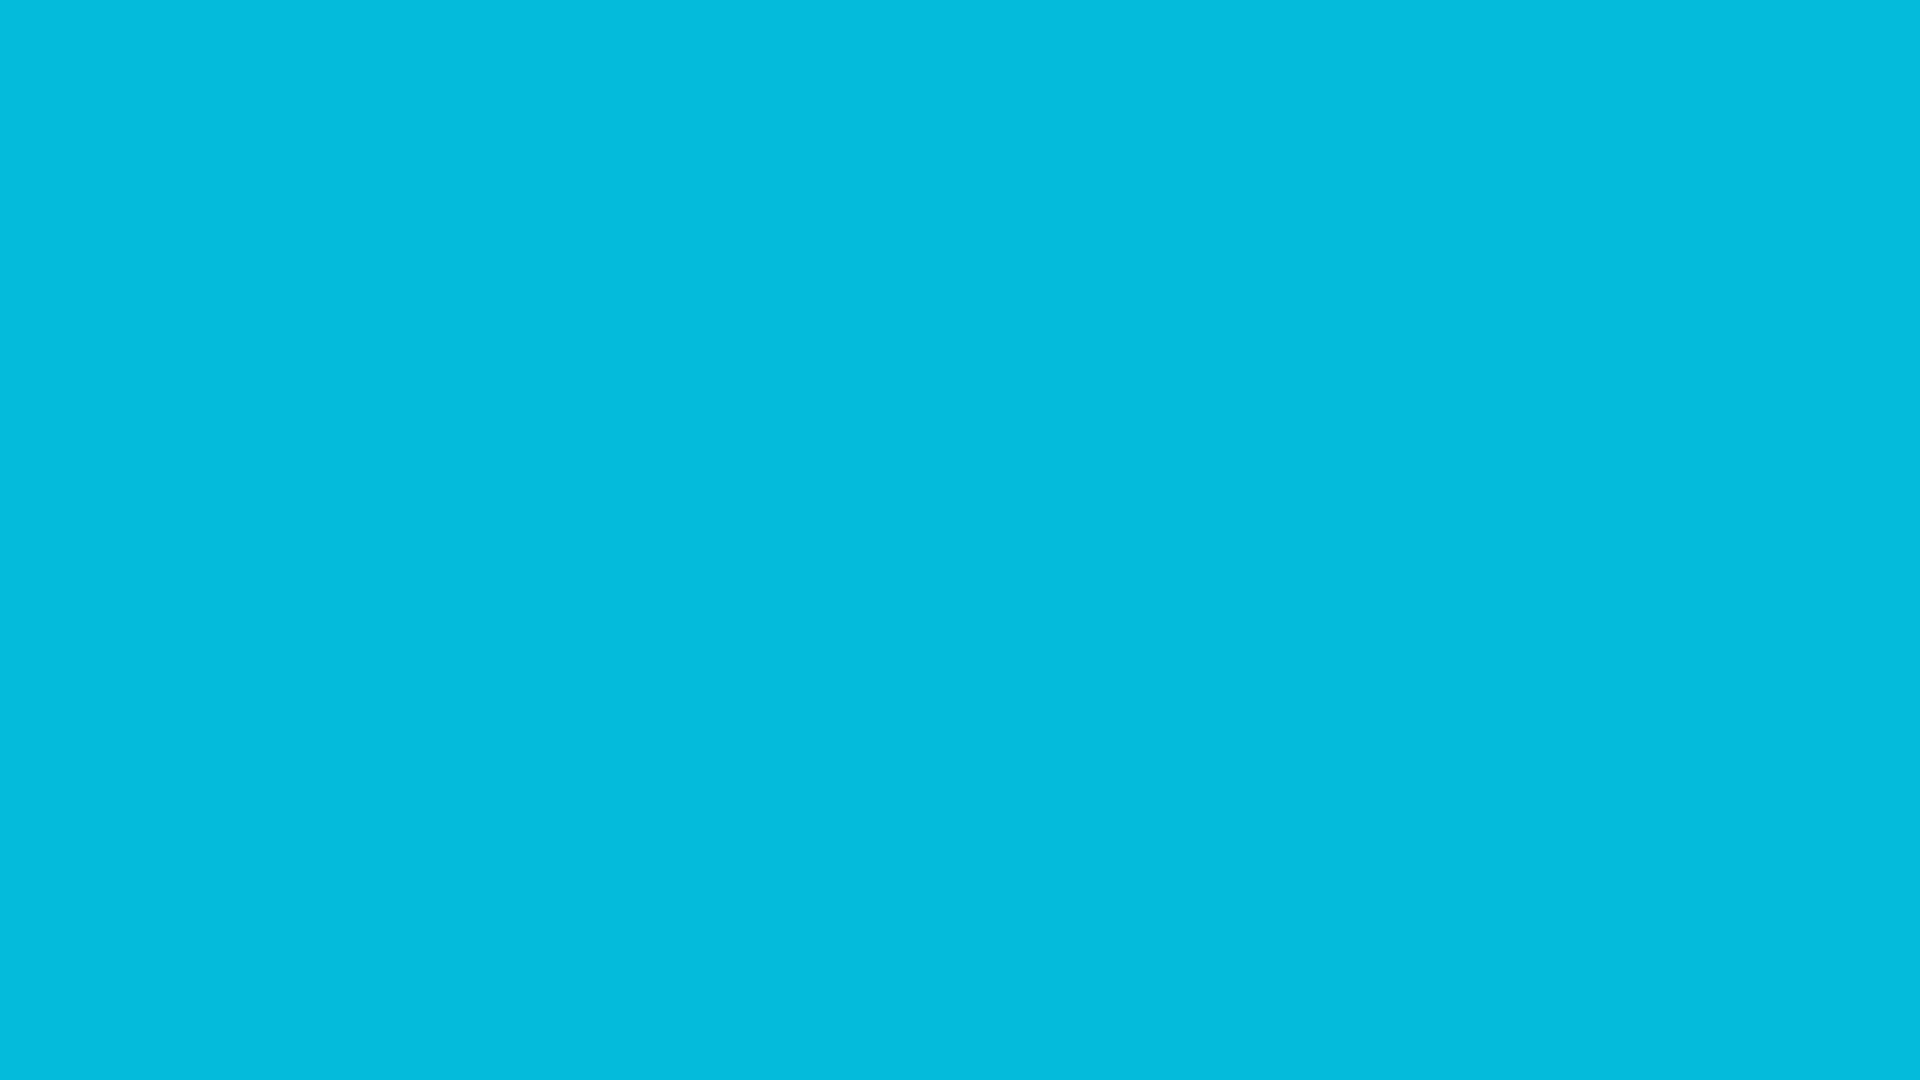 Plain Blue Wallpaper image hd